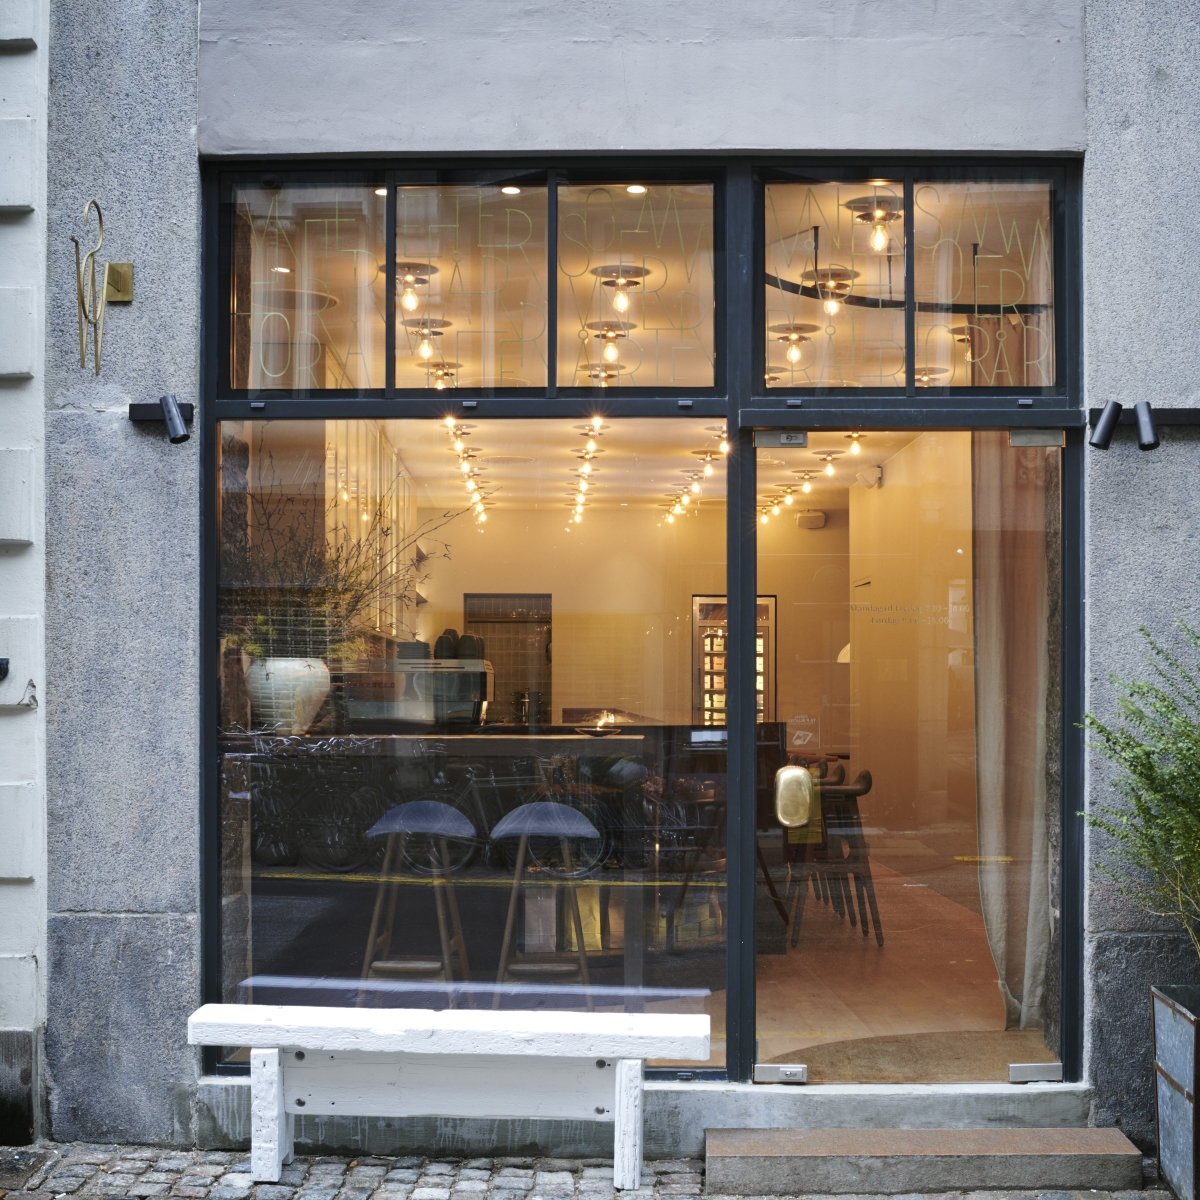 Winterspring_Dessertbar in Kopenhagen_Fassade